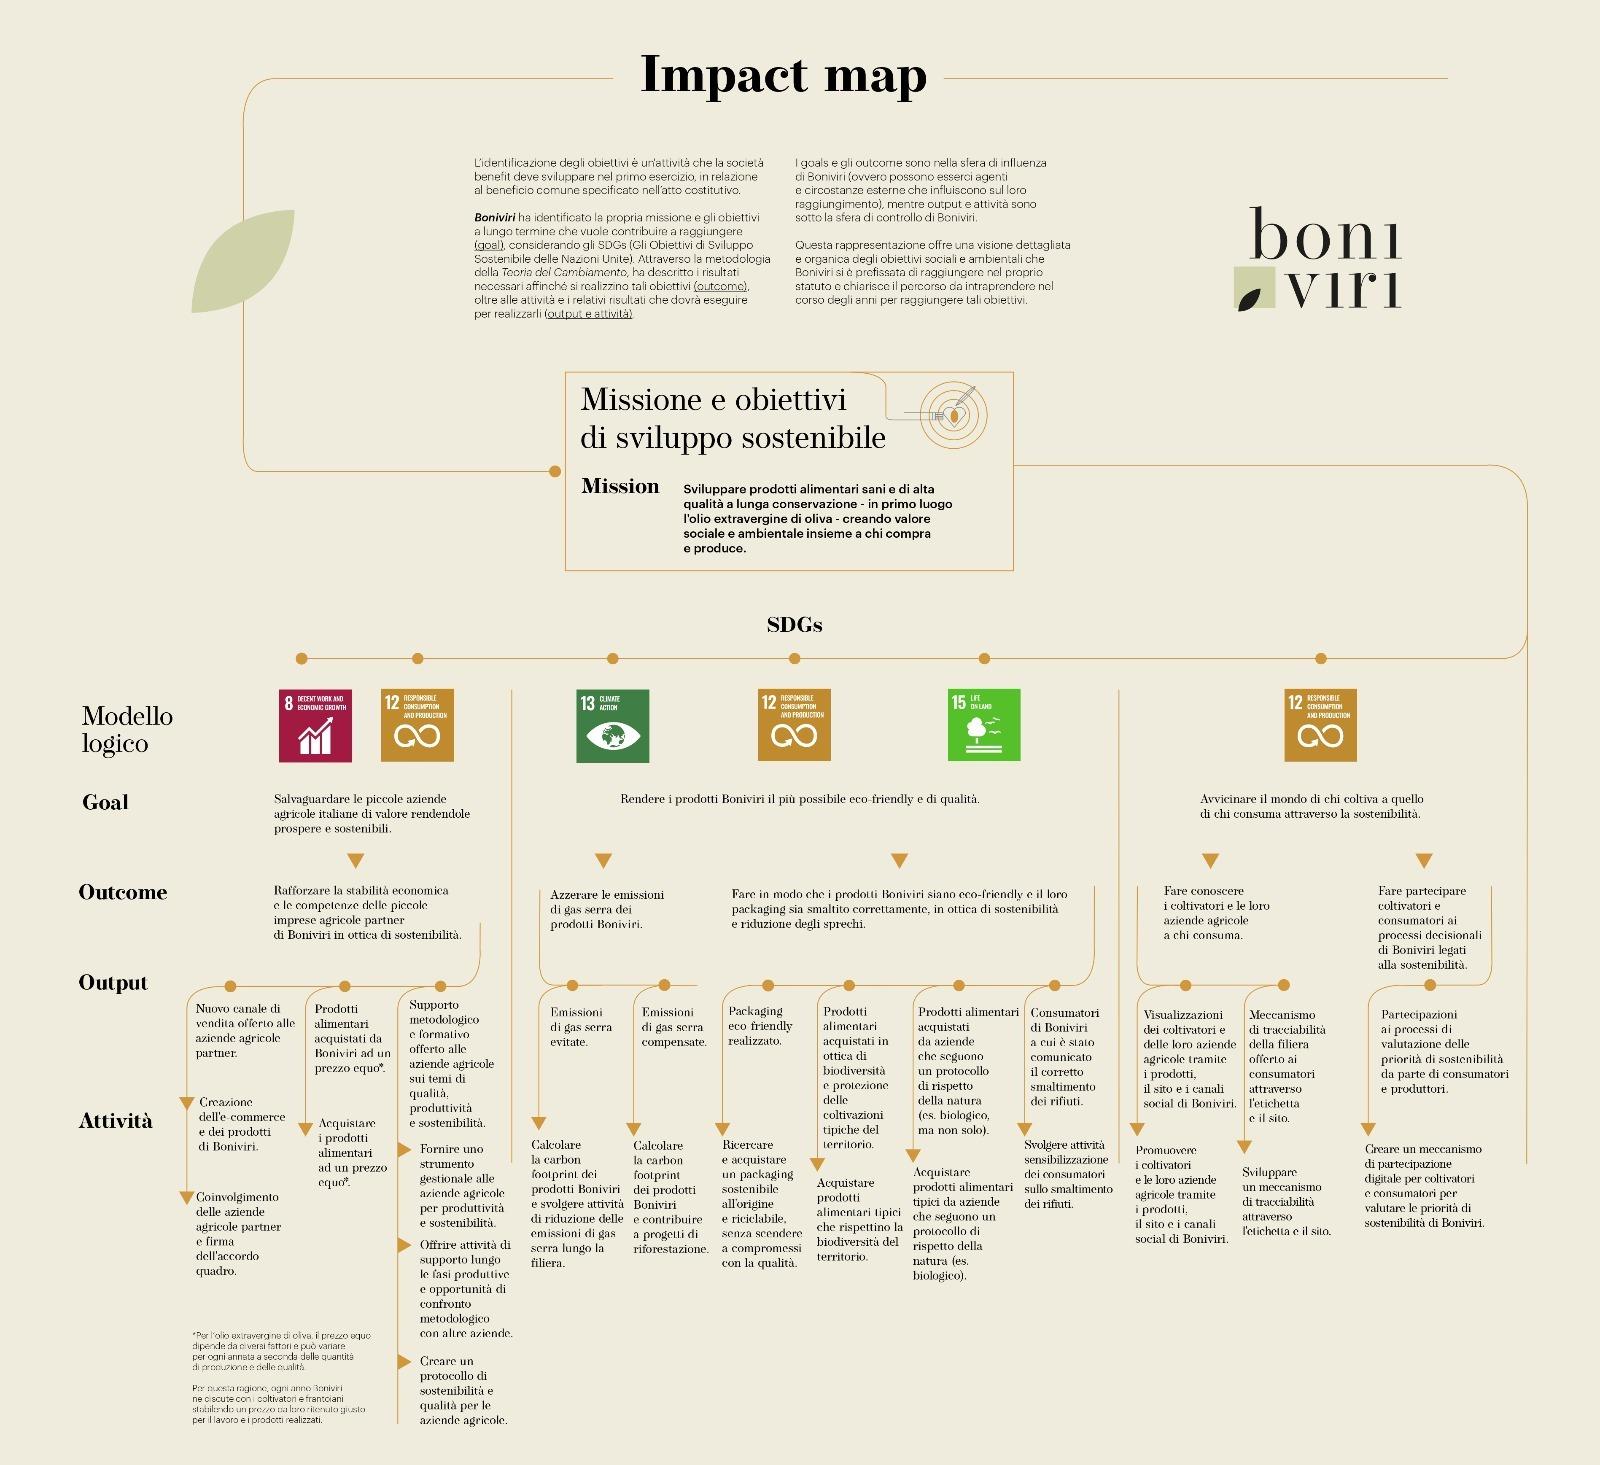 impactmappage-0001-1608316662.jpg